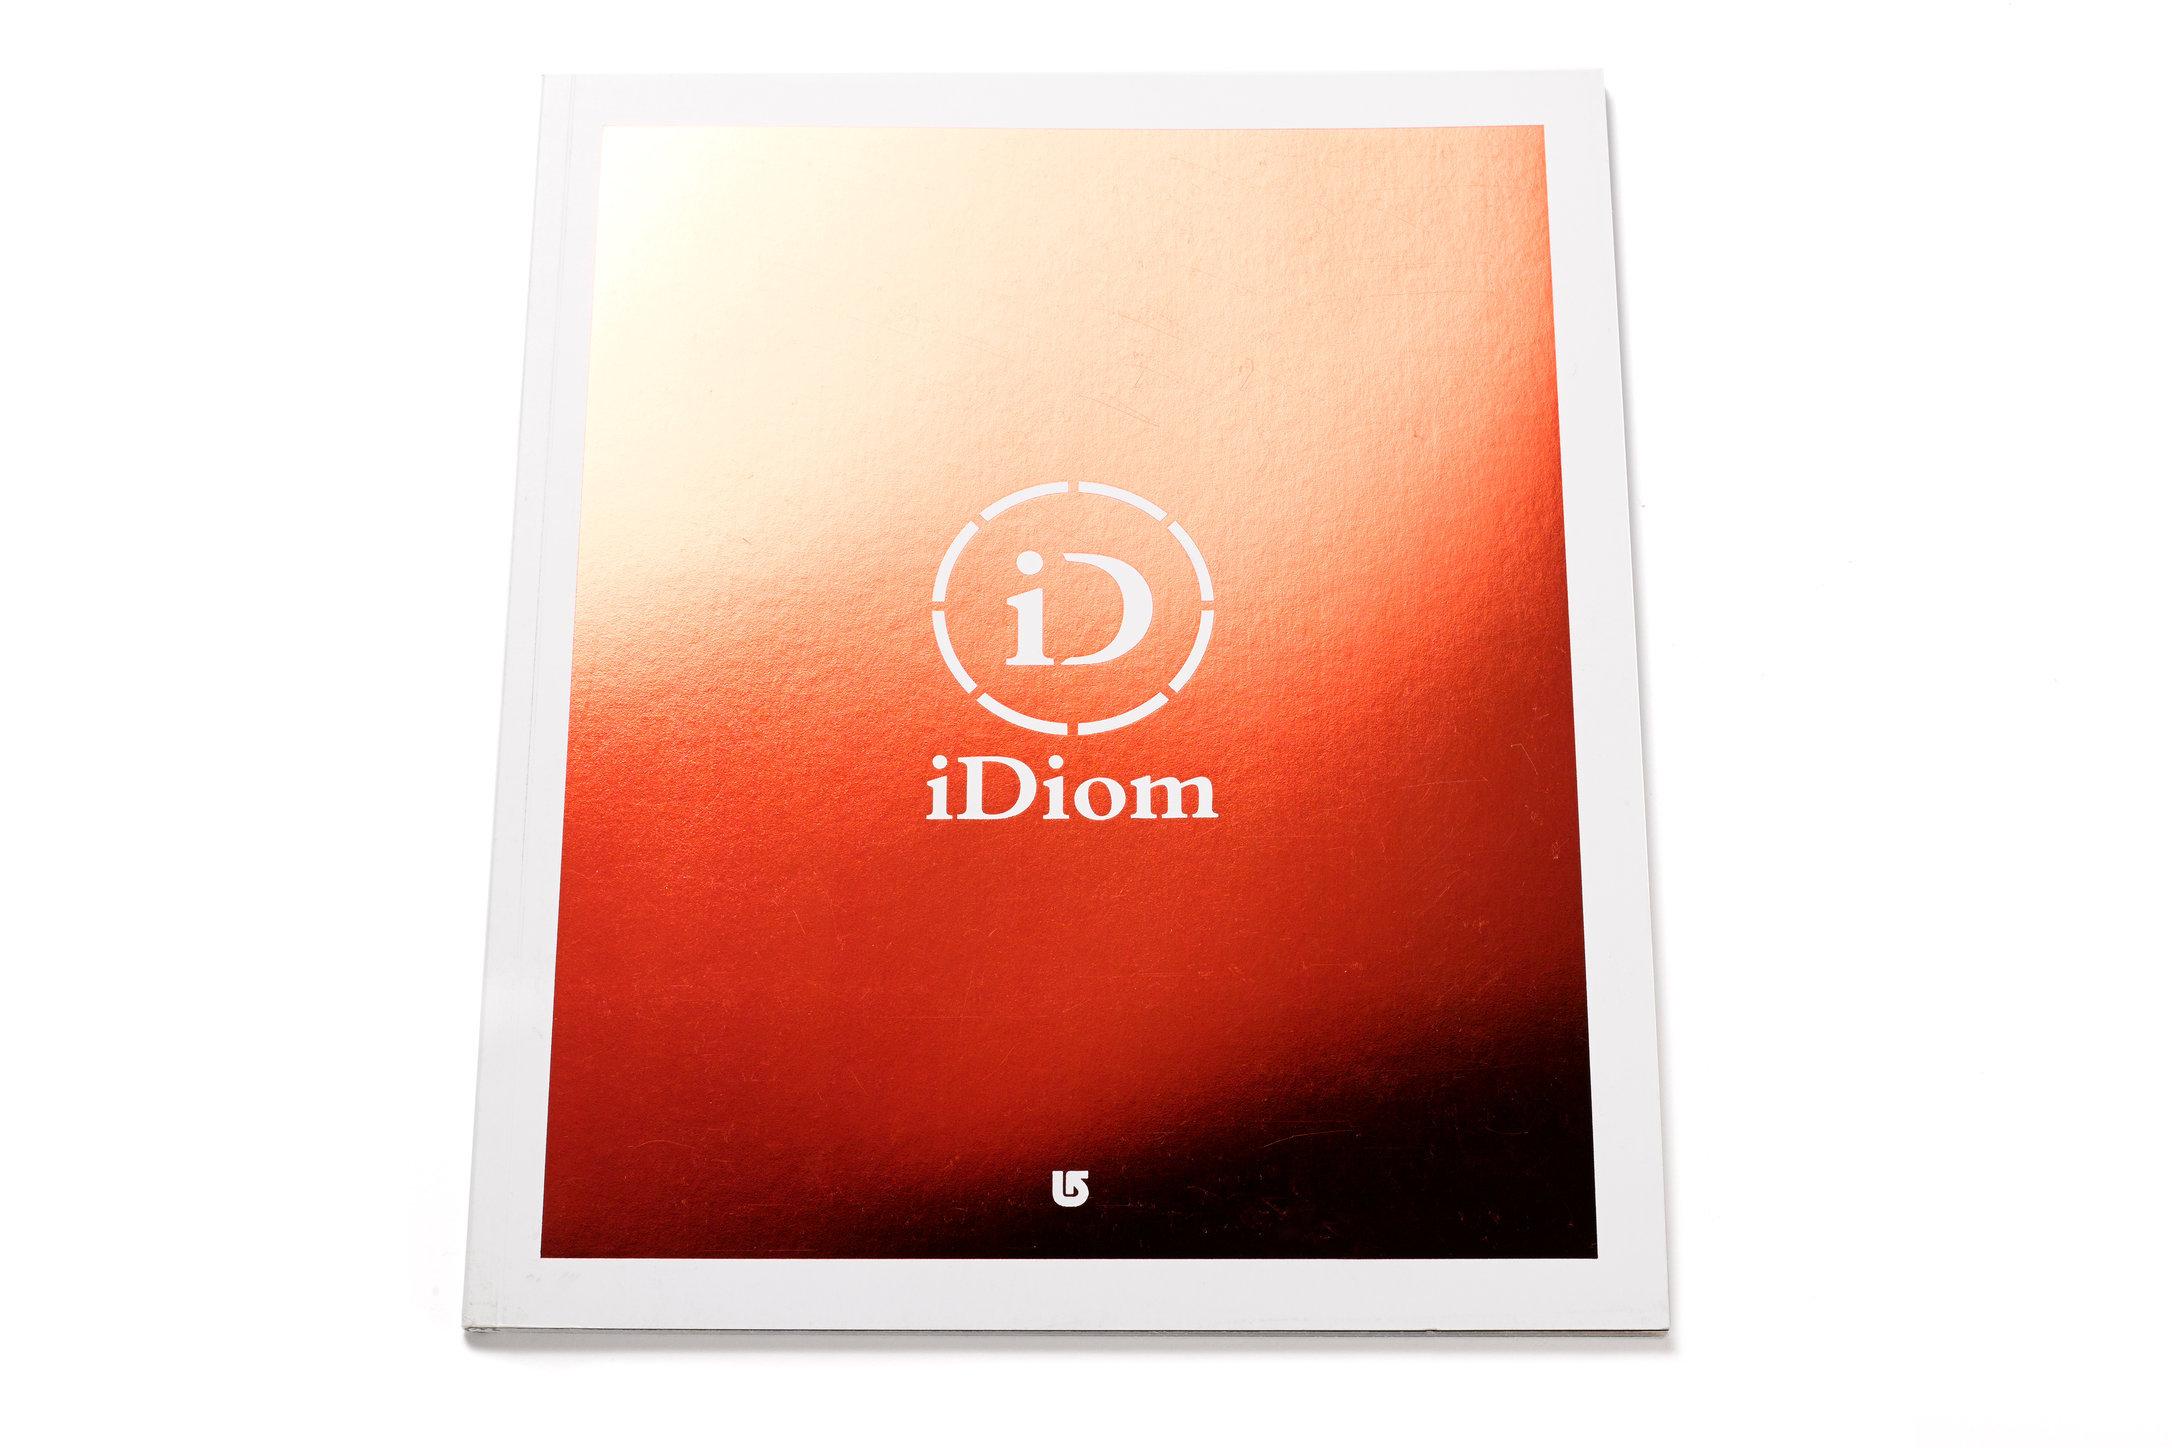 Burton Snowboards: Idiom catalog